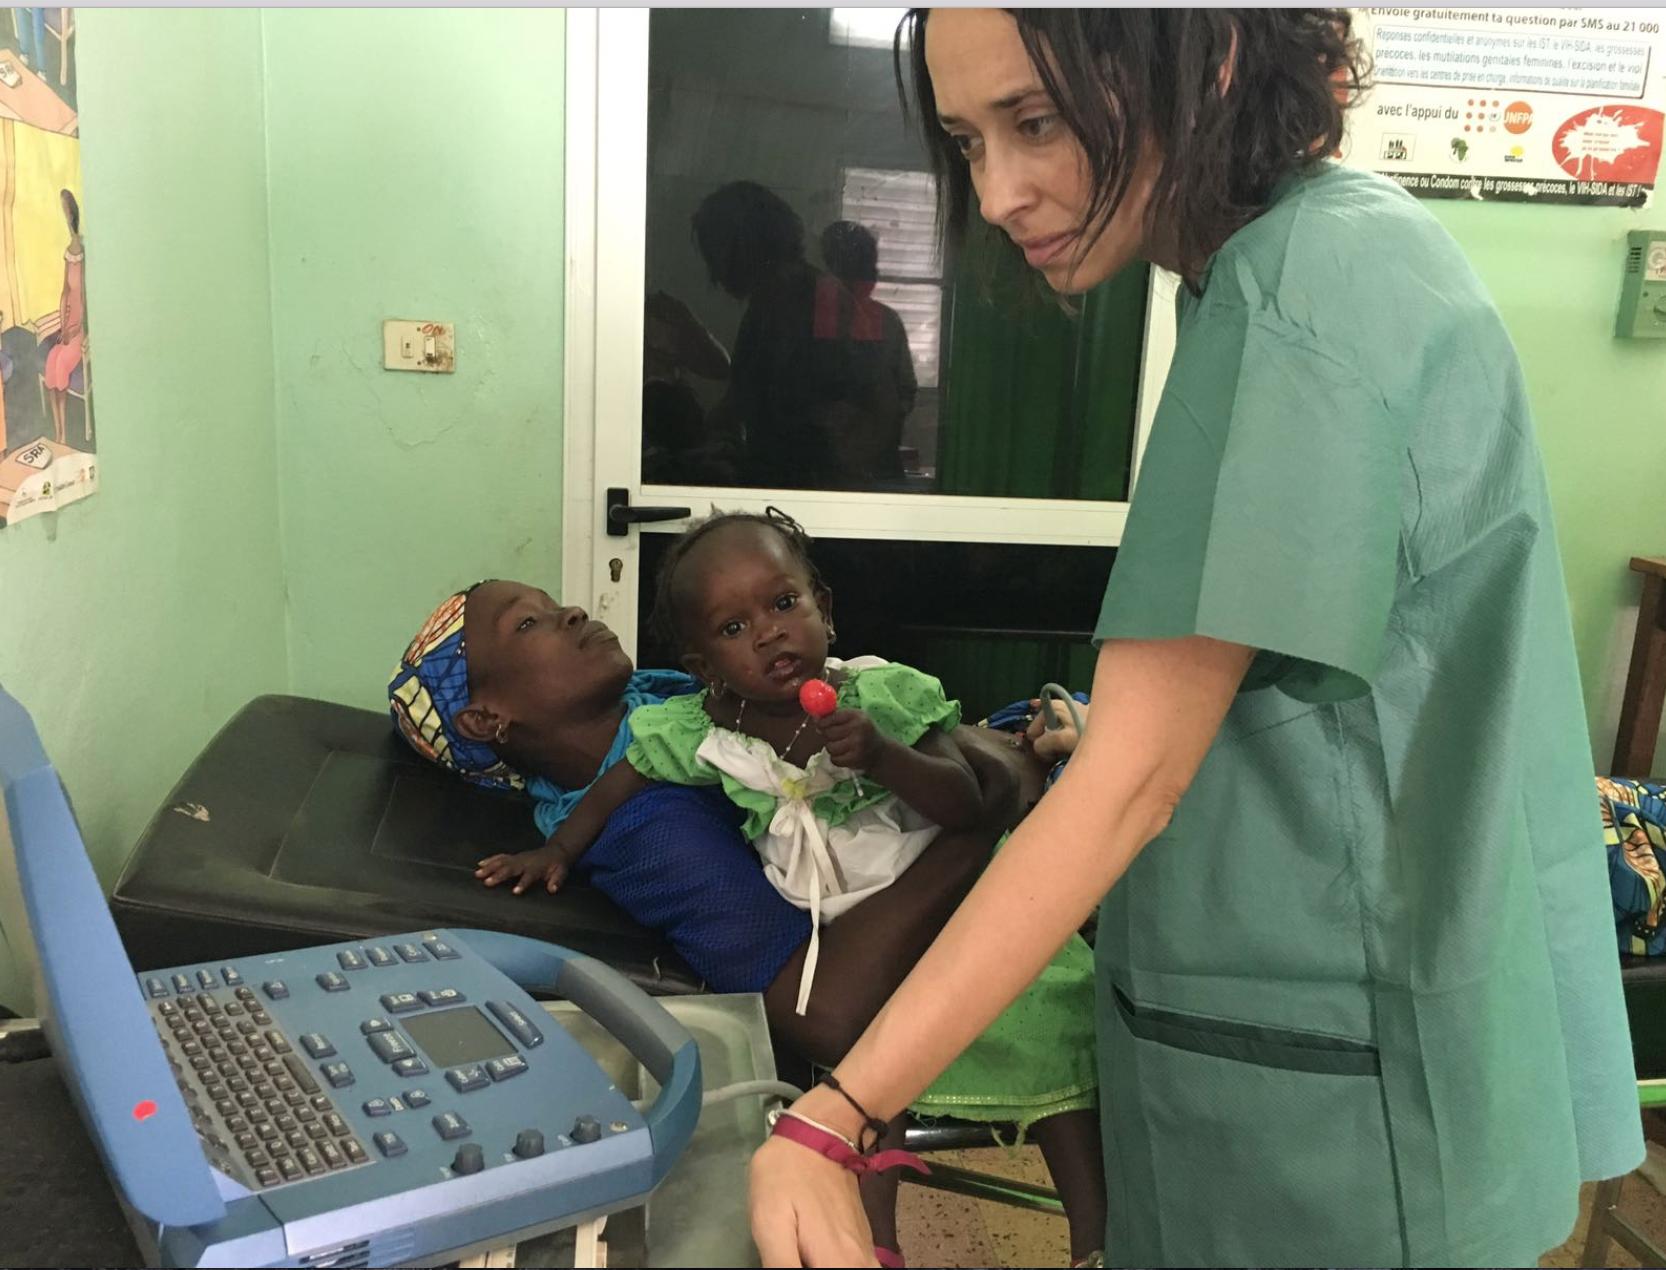 PANISH NGO CIRUGÍA SOLIDARIA USES M-TURBO IN KENYAN HEALTH MISSION